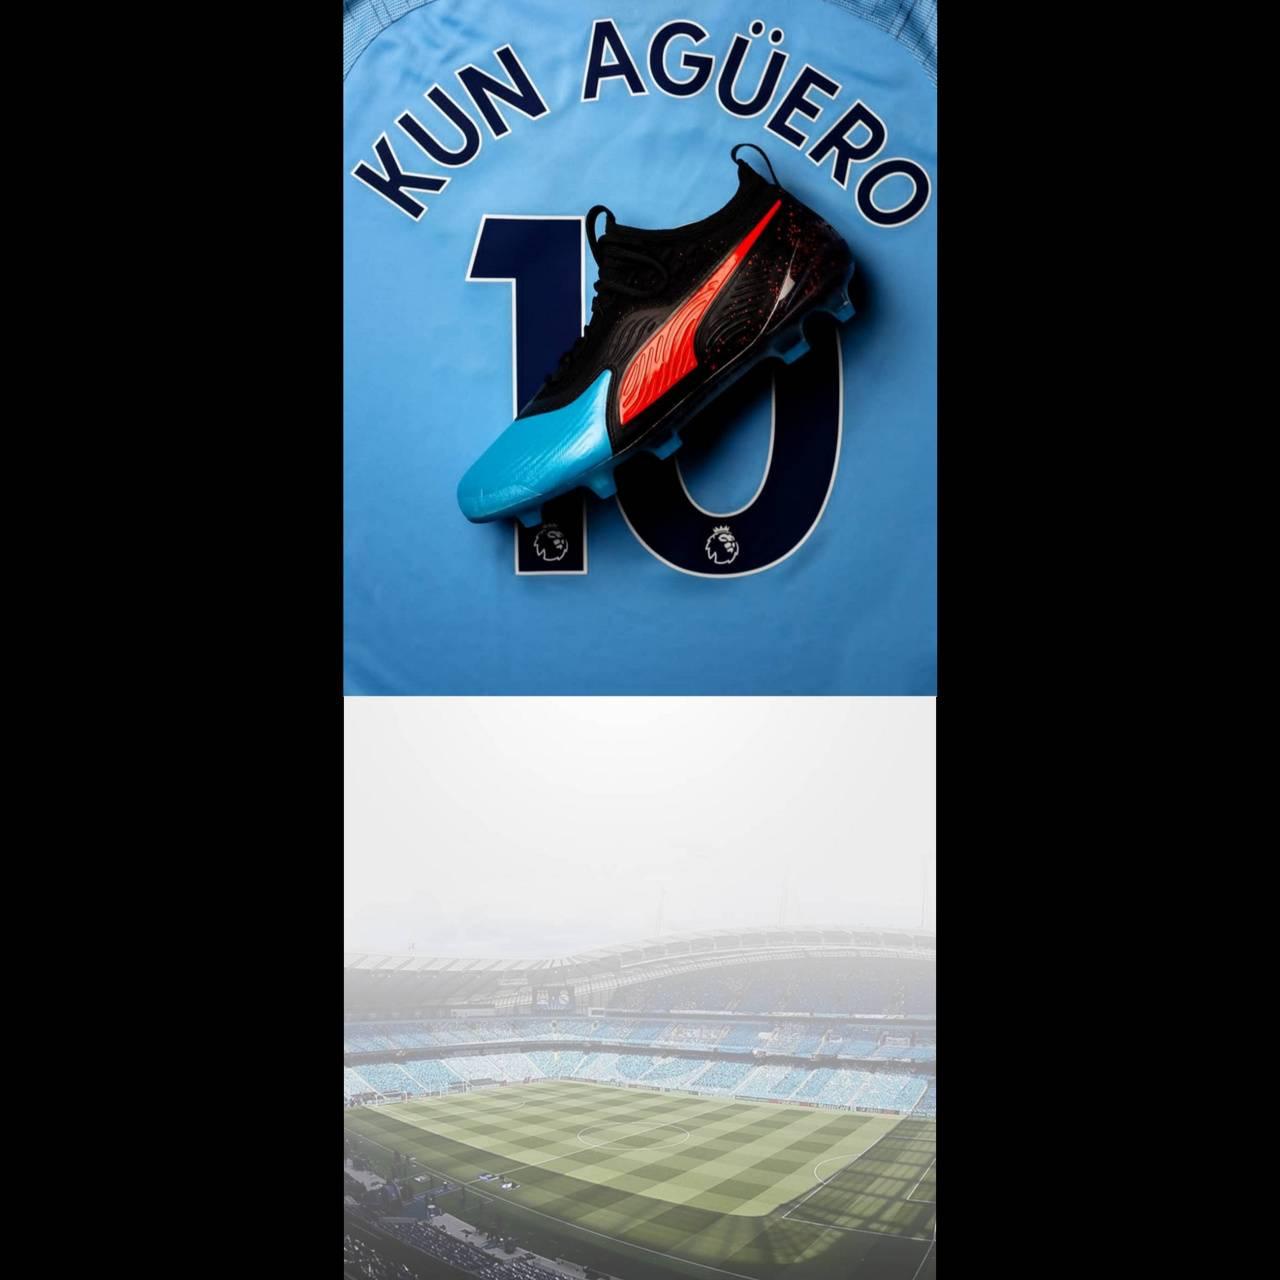 Aguero stadium